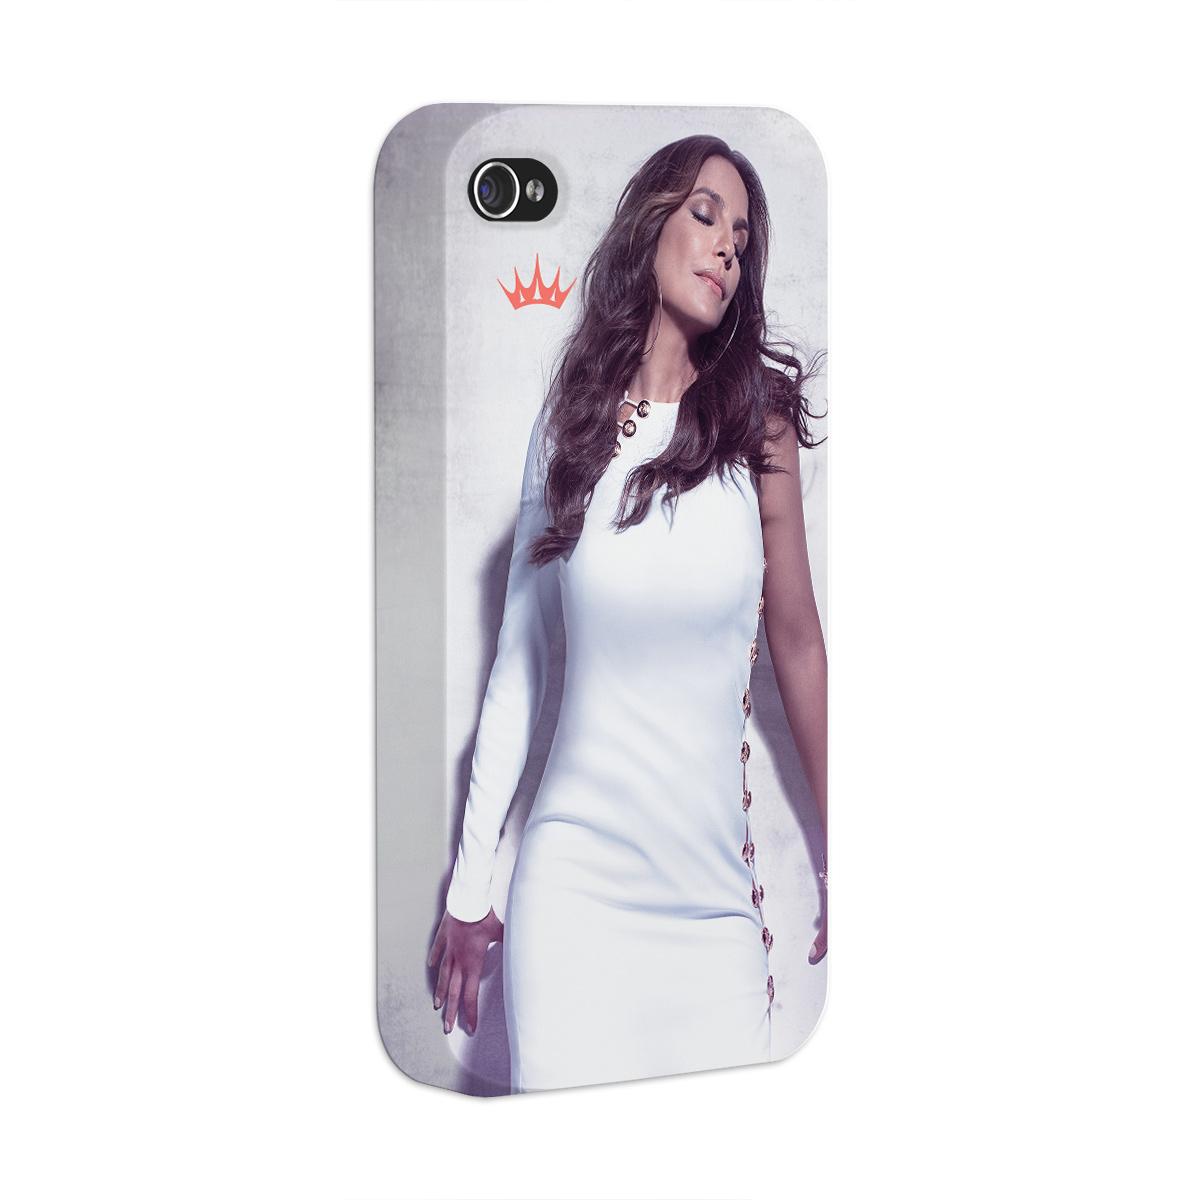 Capa para iPhone 4/4S Ivete Sangalo Careless Whisper